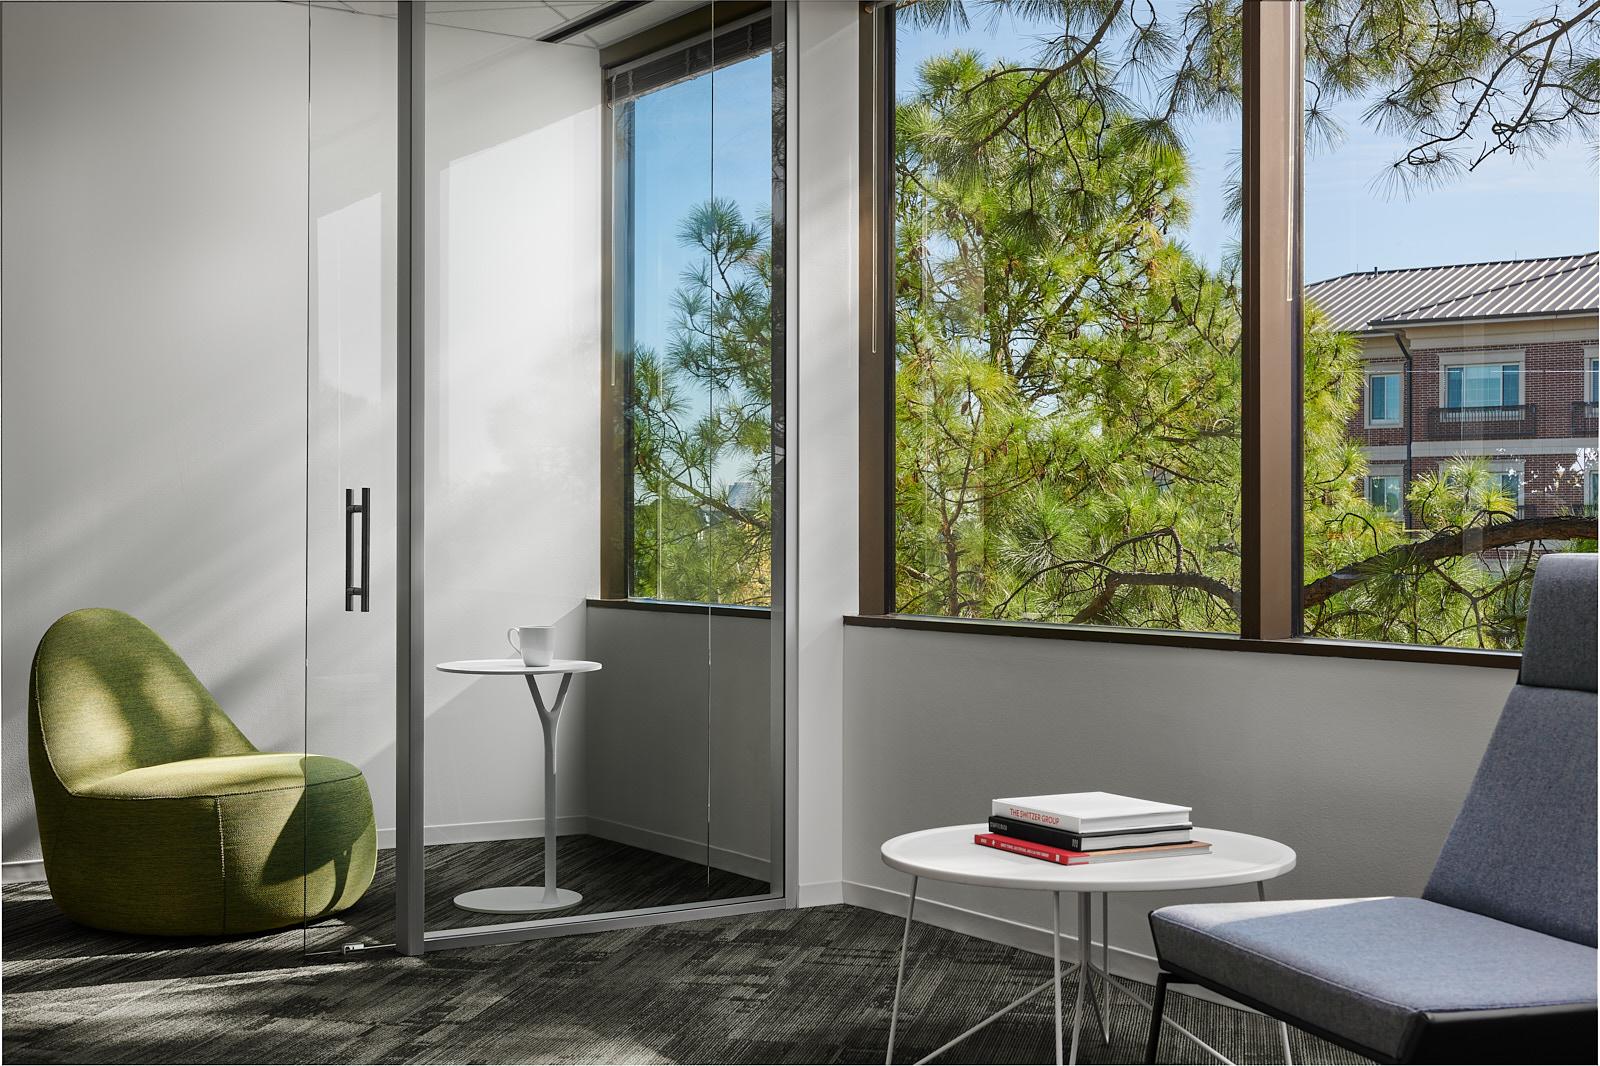 Institutional Corporate Office Interior Design Belmont Village Private Phone room